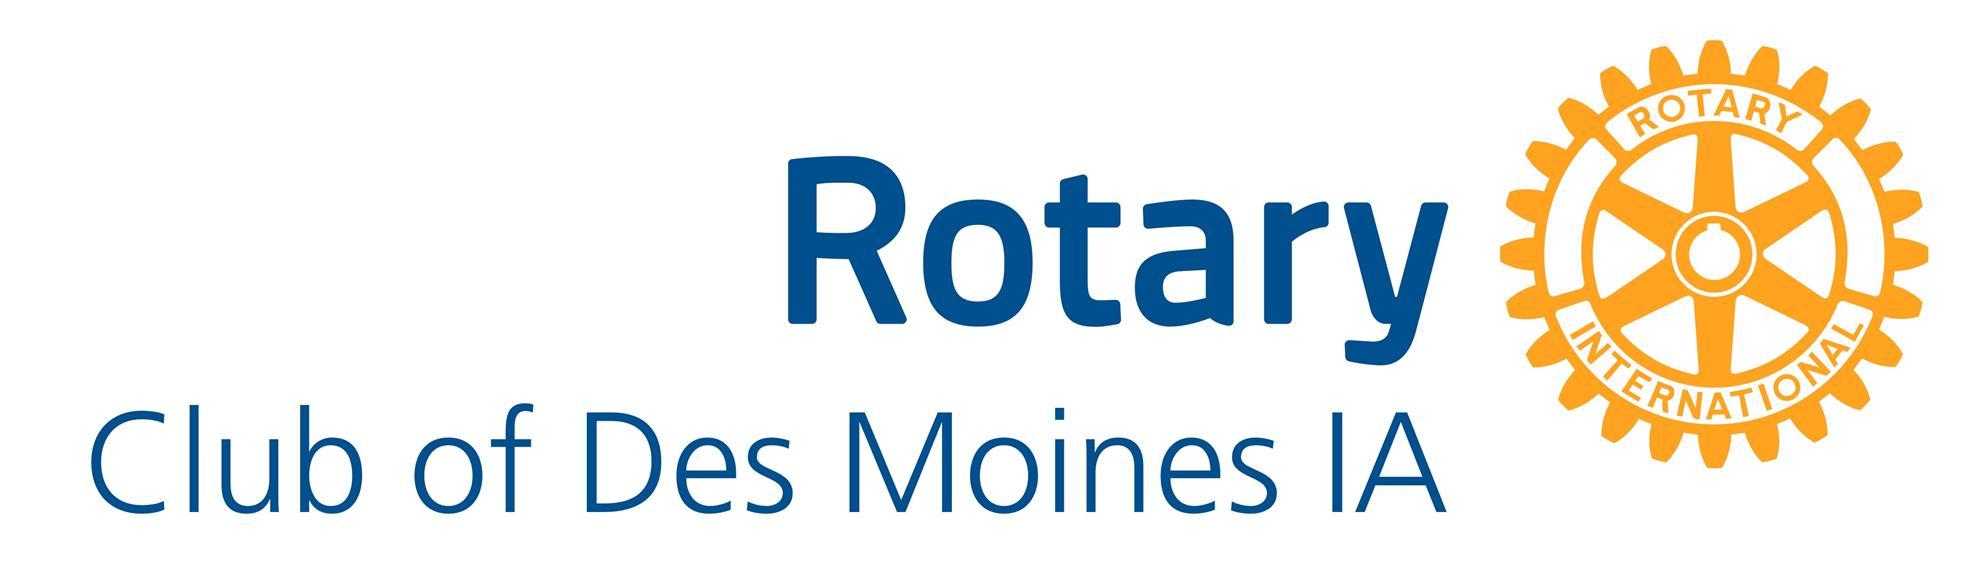 Des Moines logo